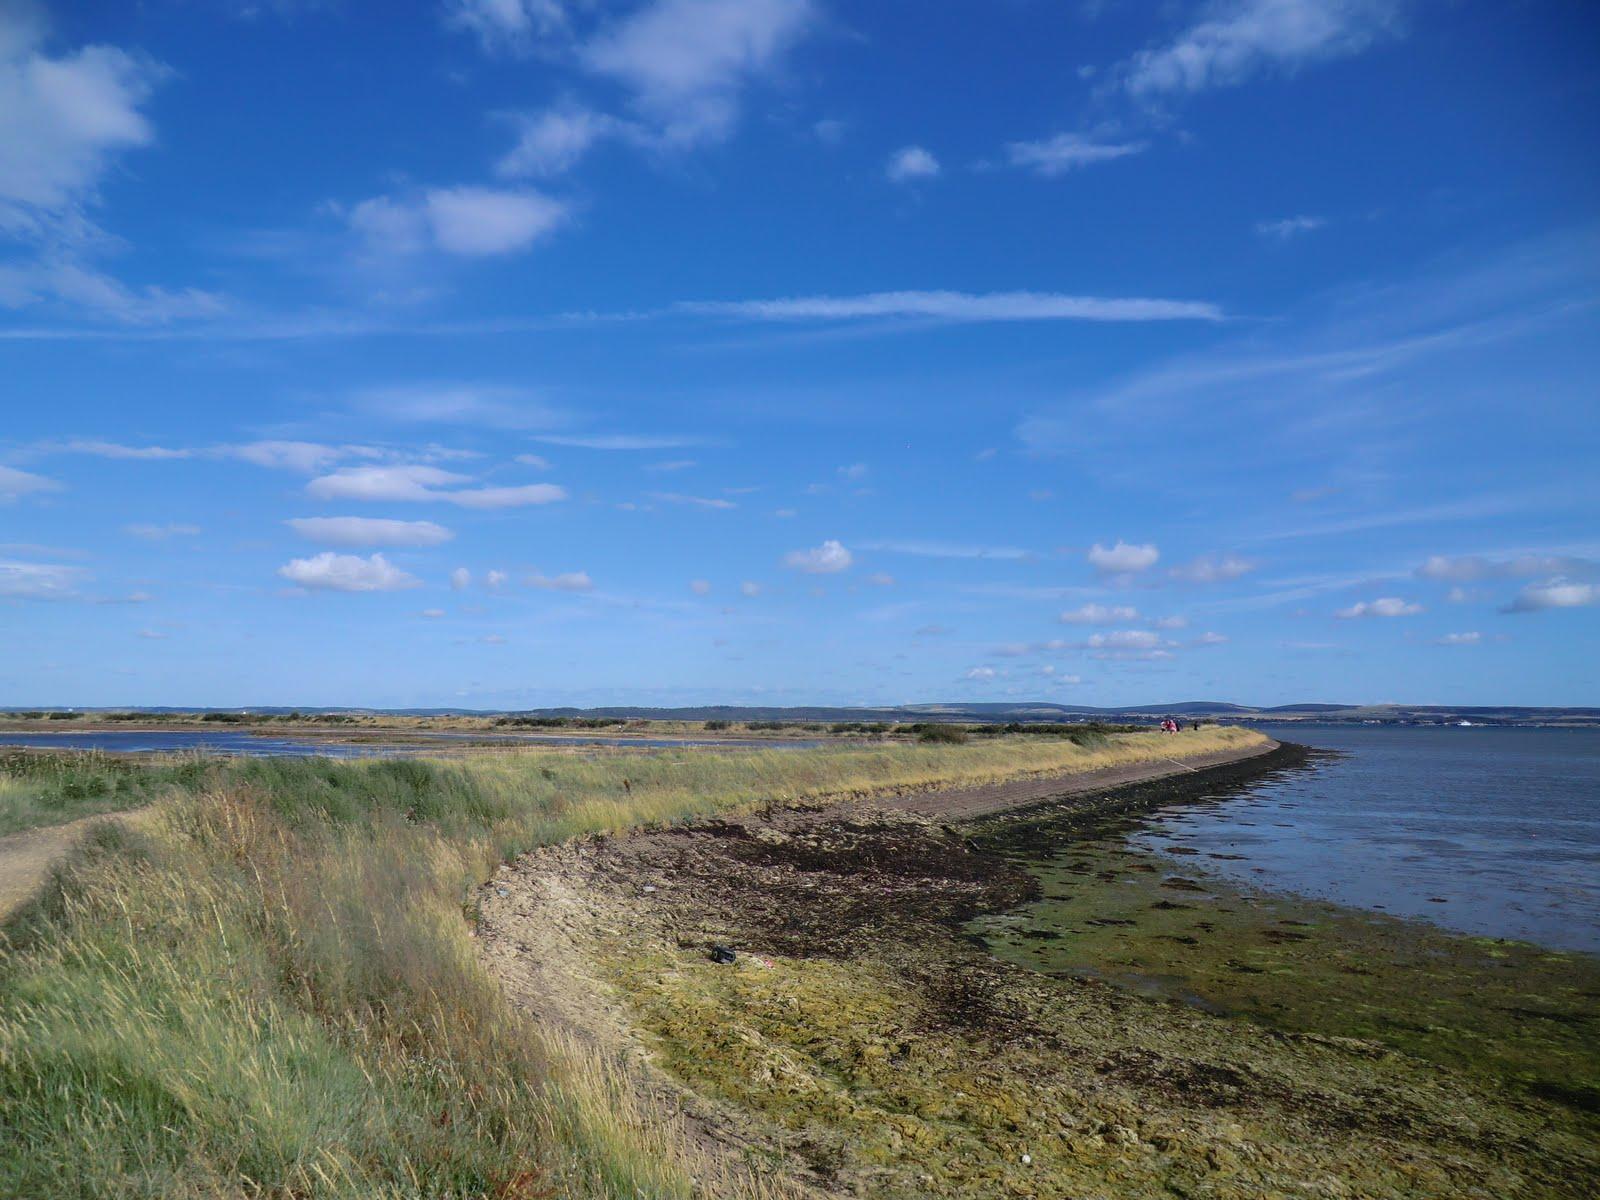 CIMG4490 The Solent Way around Normandy Marsh